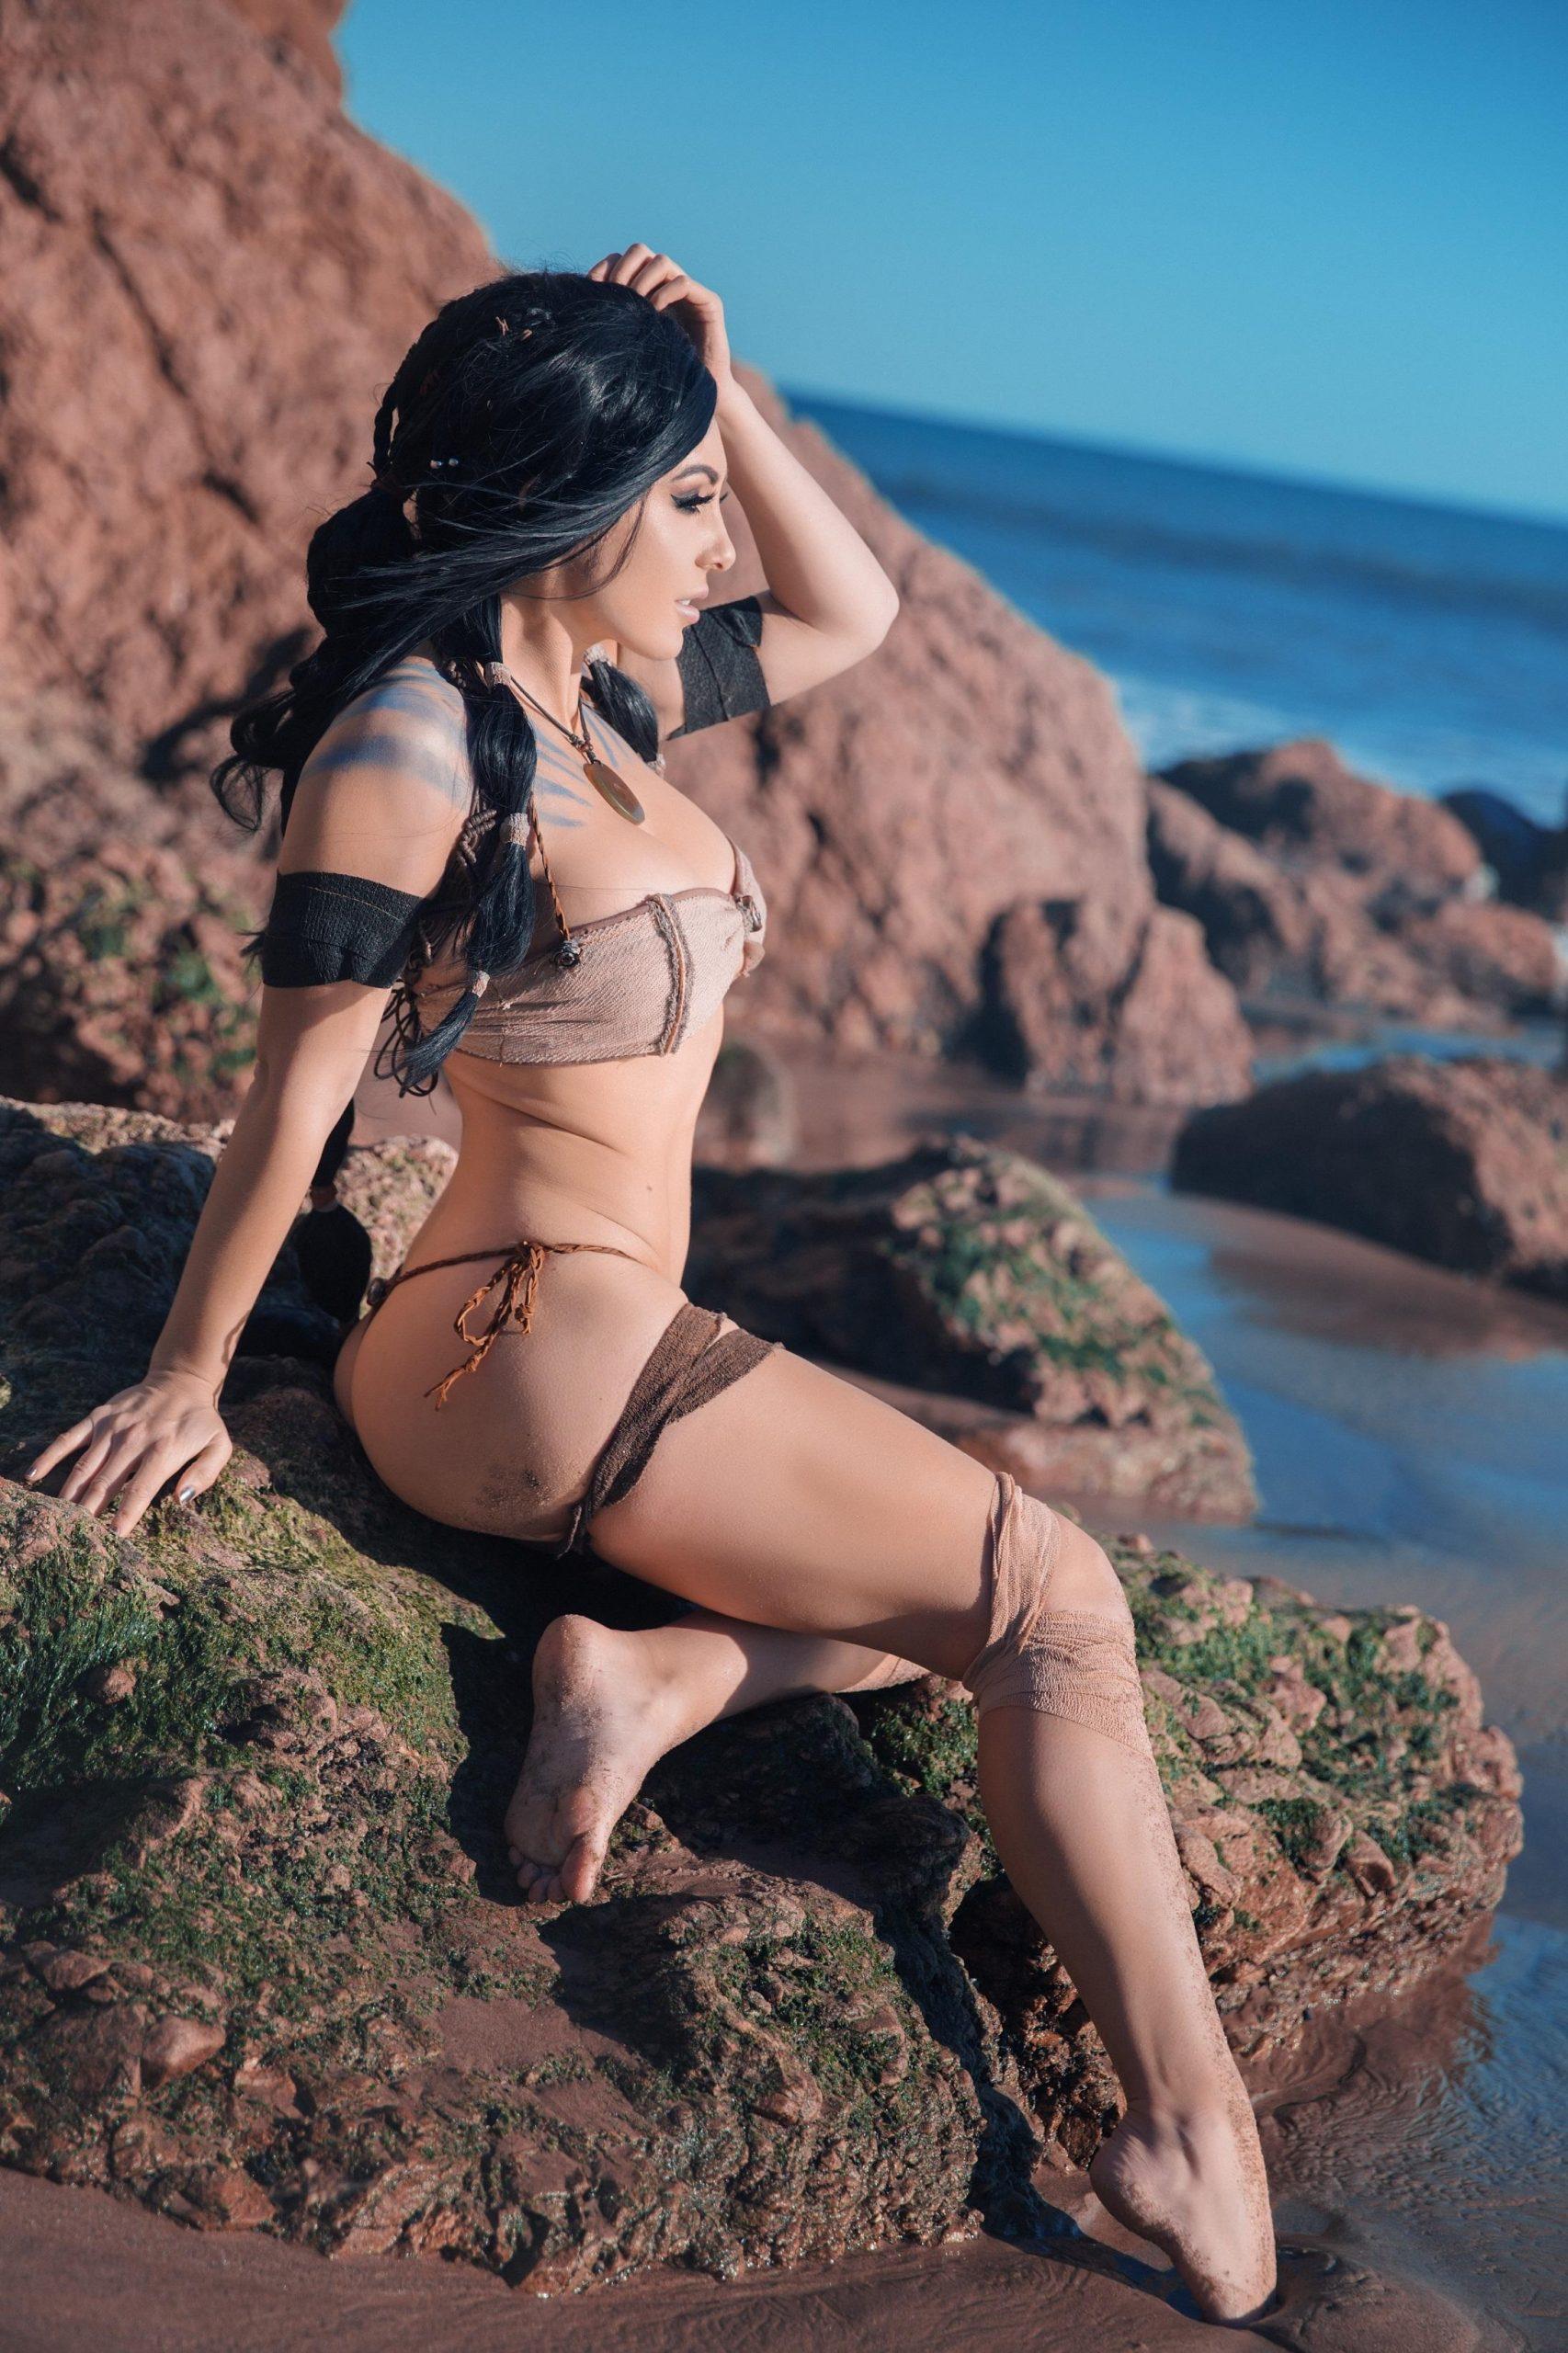 Jessica Nigri sexy look pic